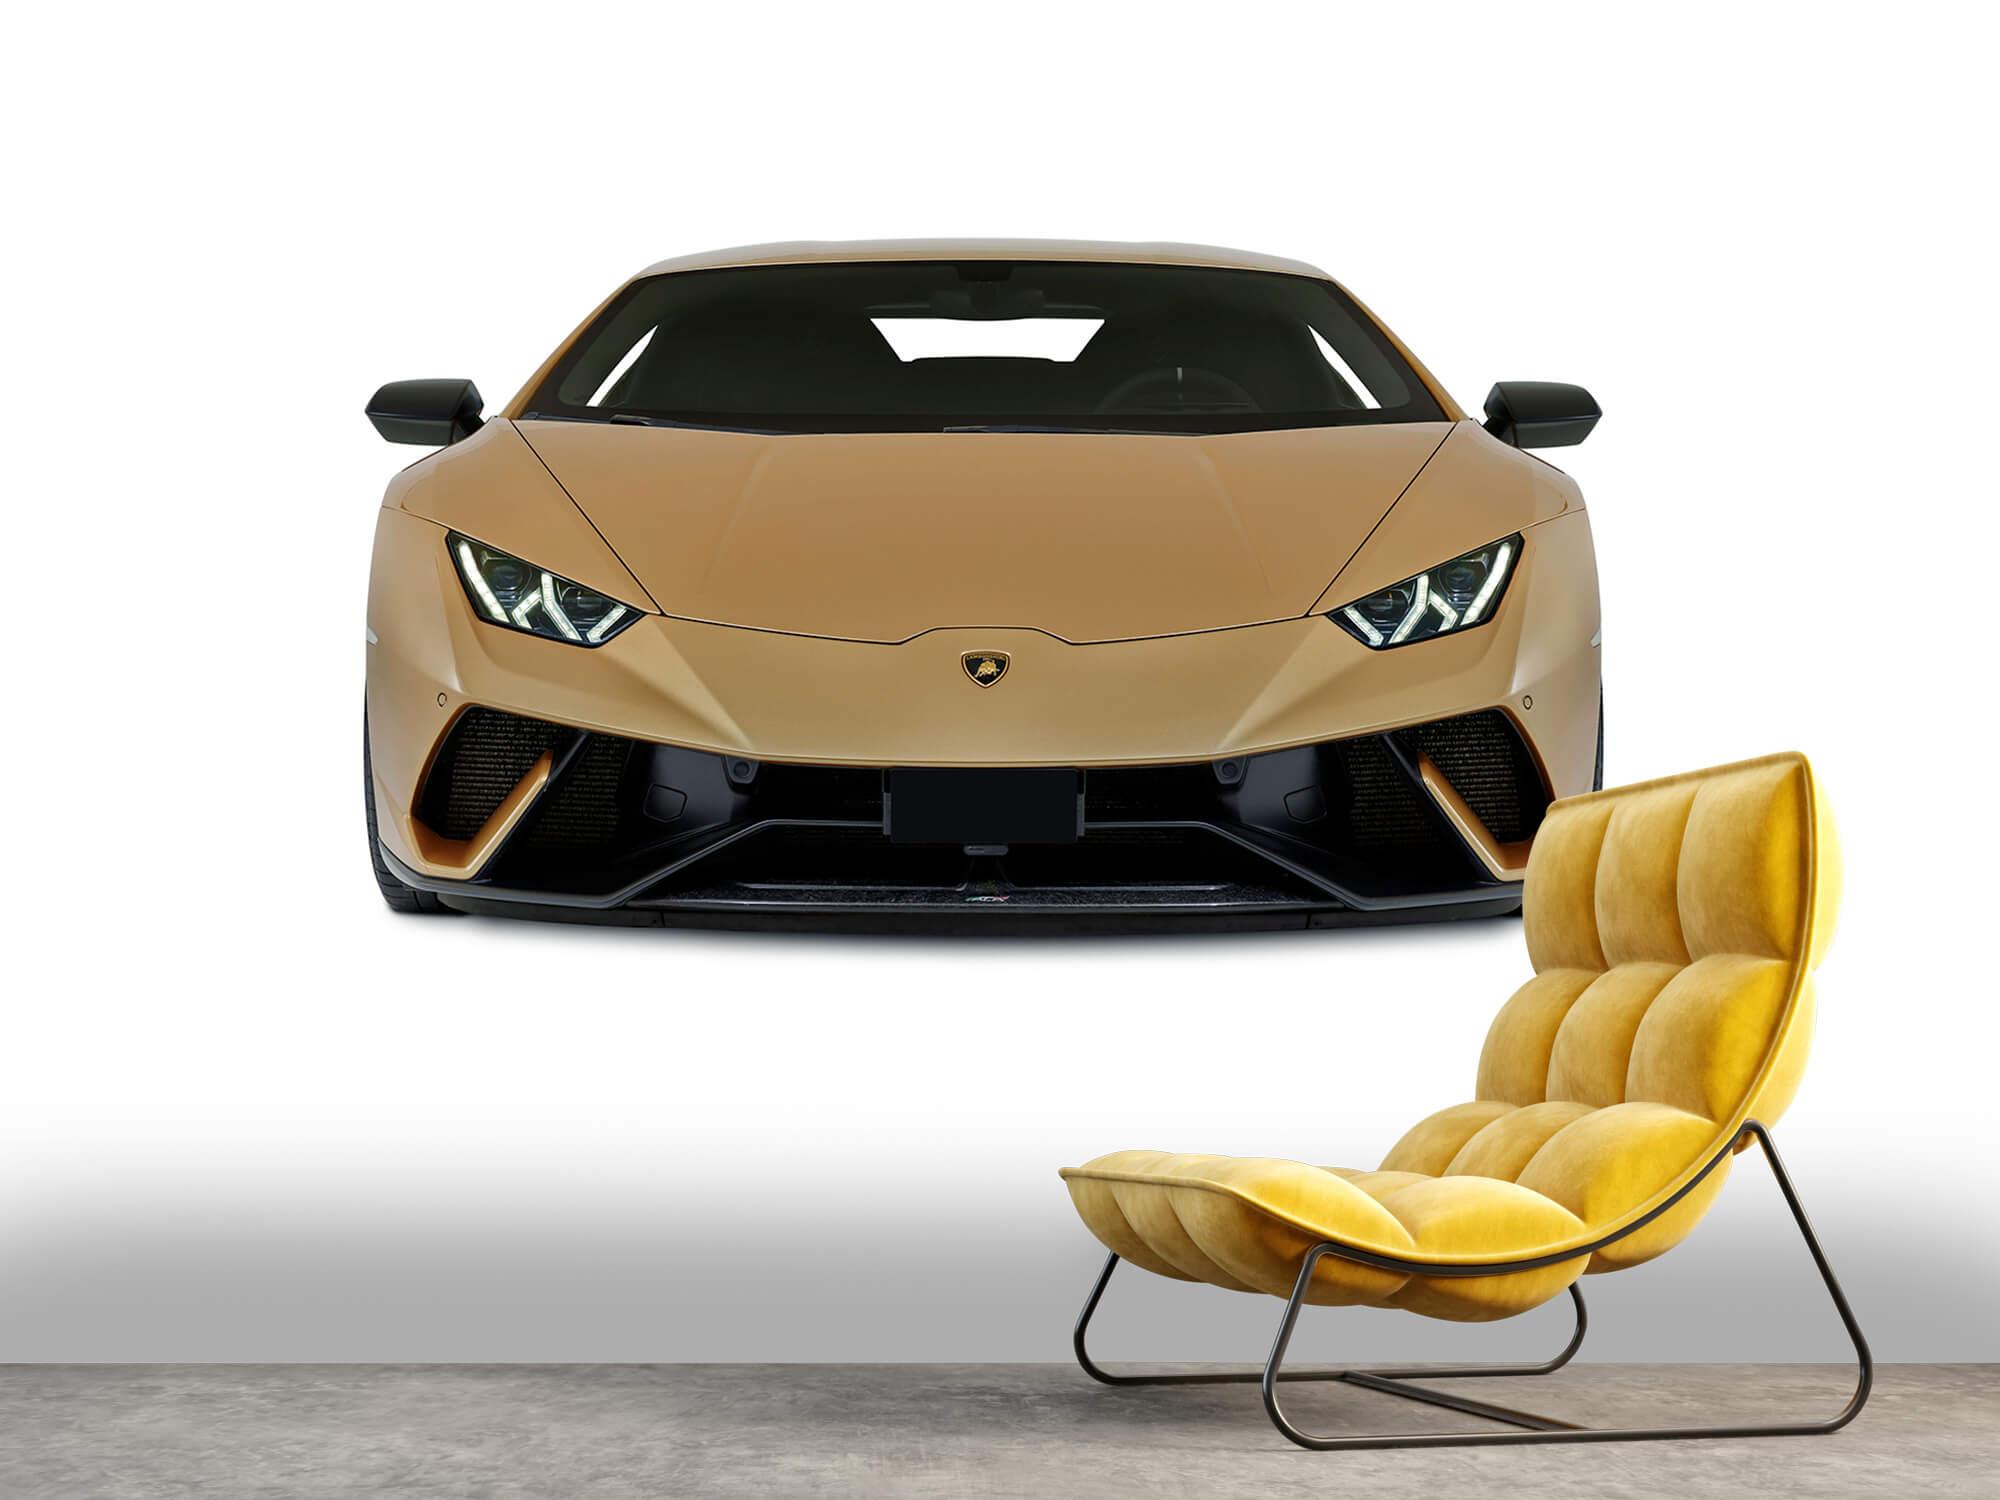 Wallpaper Lamborghini Huracán - Voorkant, wit 6